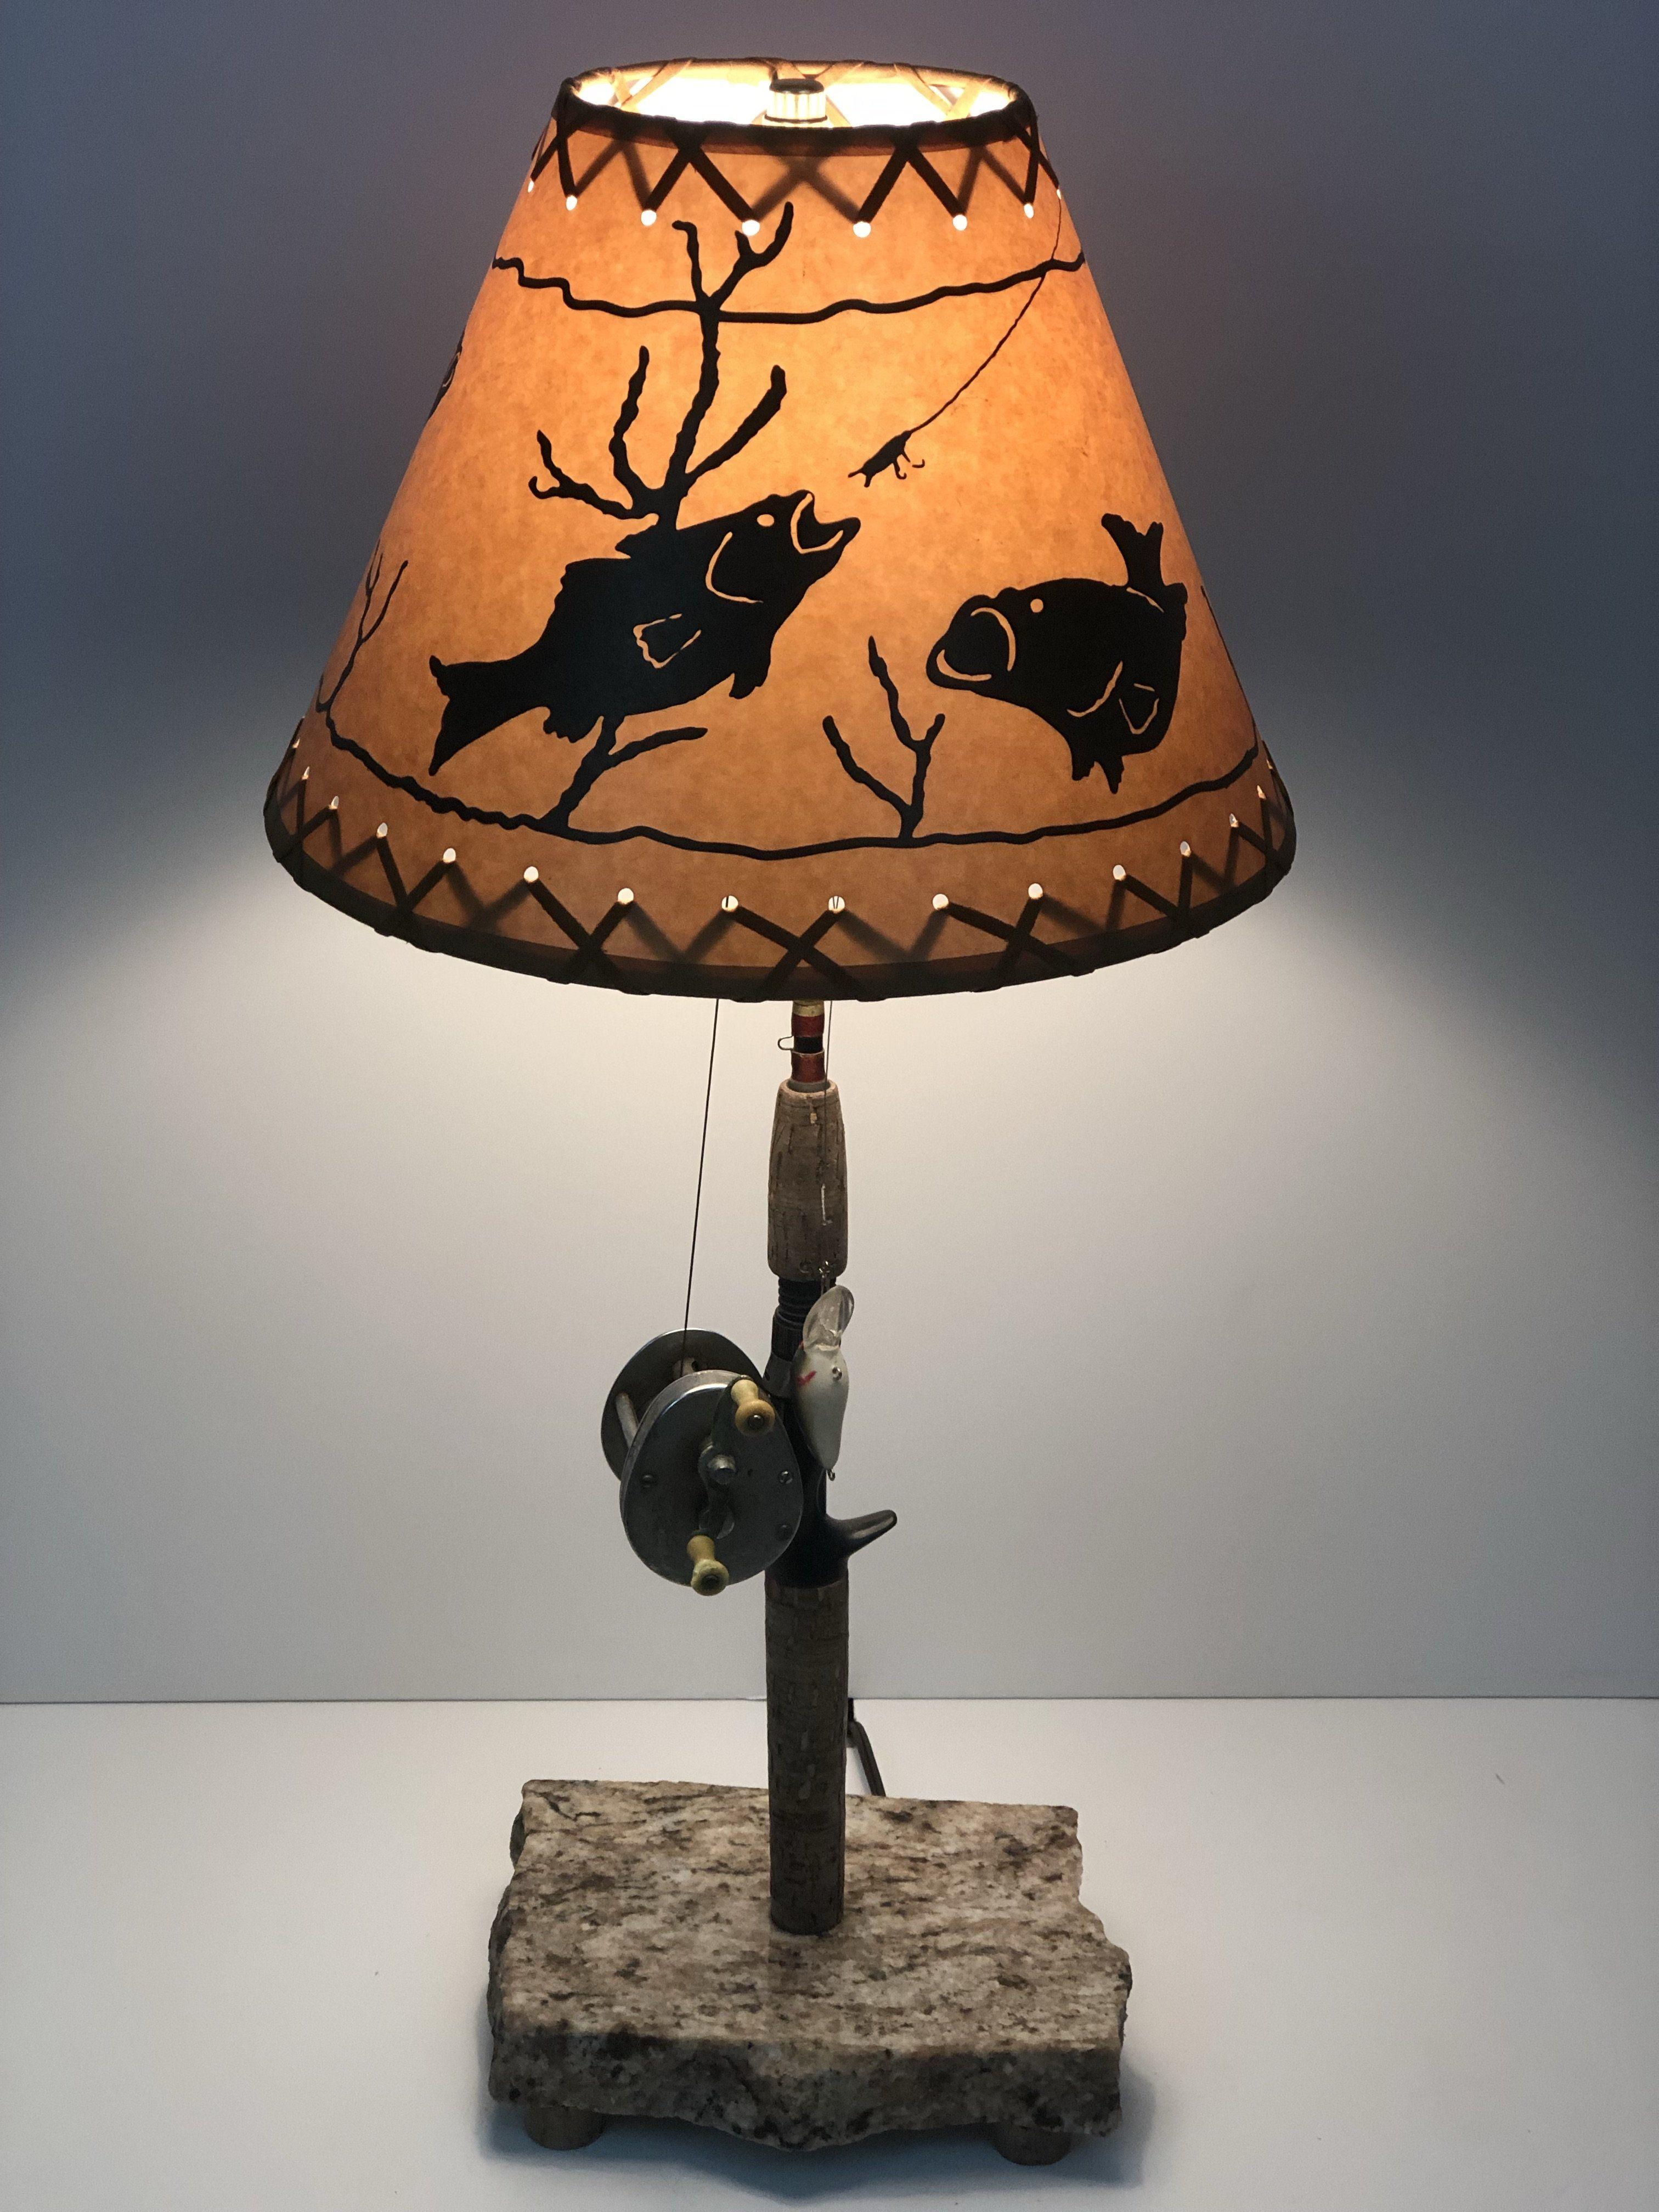 Bass Night Stand Lamp #1630 | Nightstand lamp, Lamp, Table ...